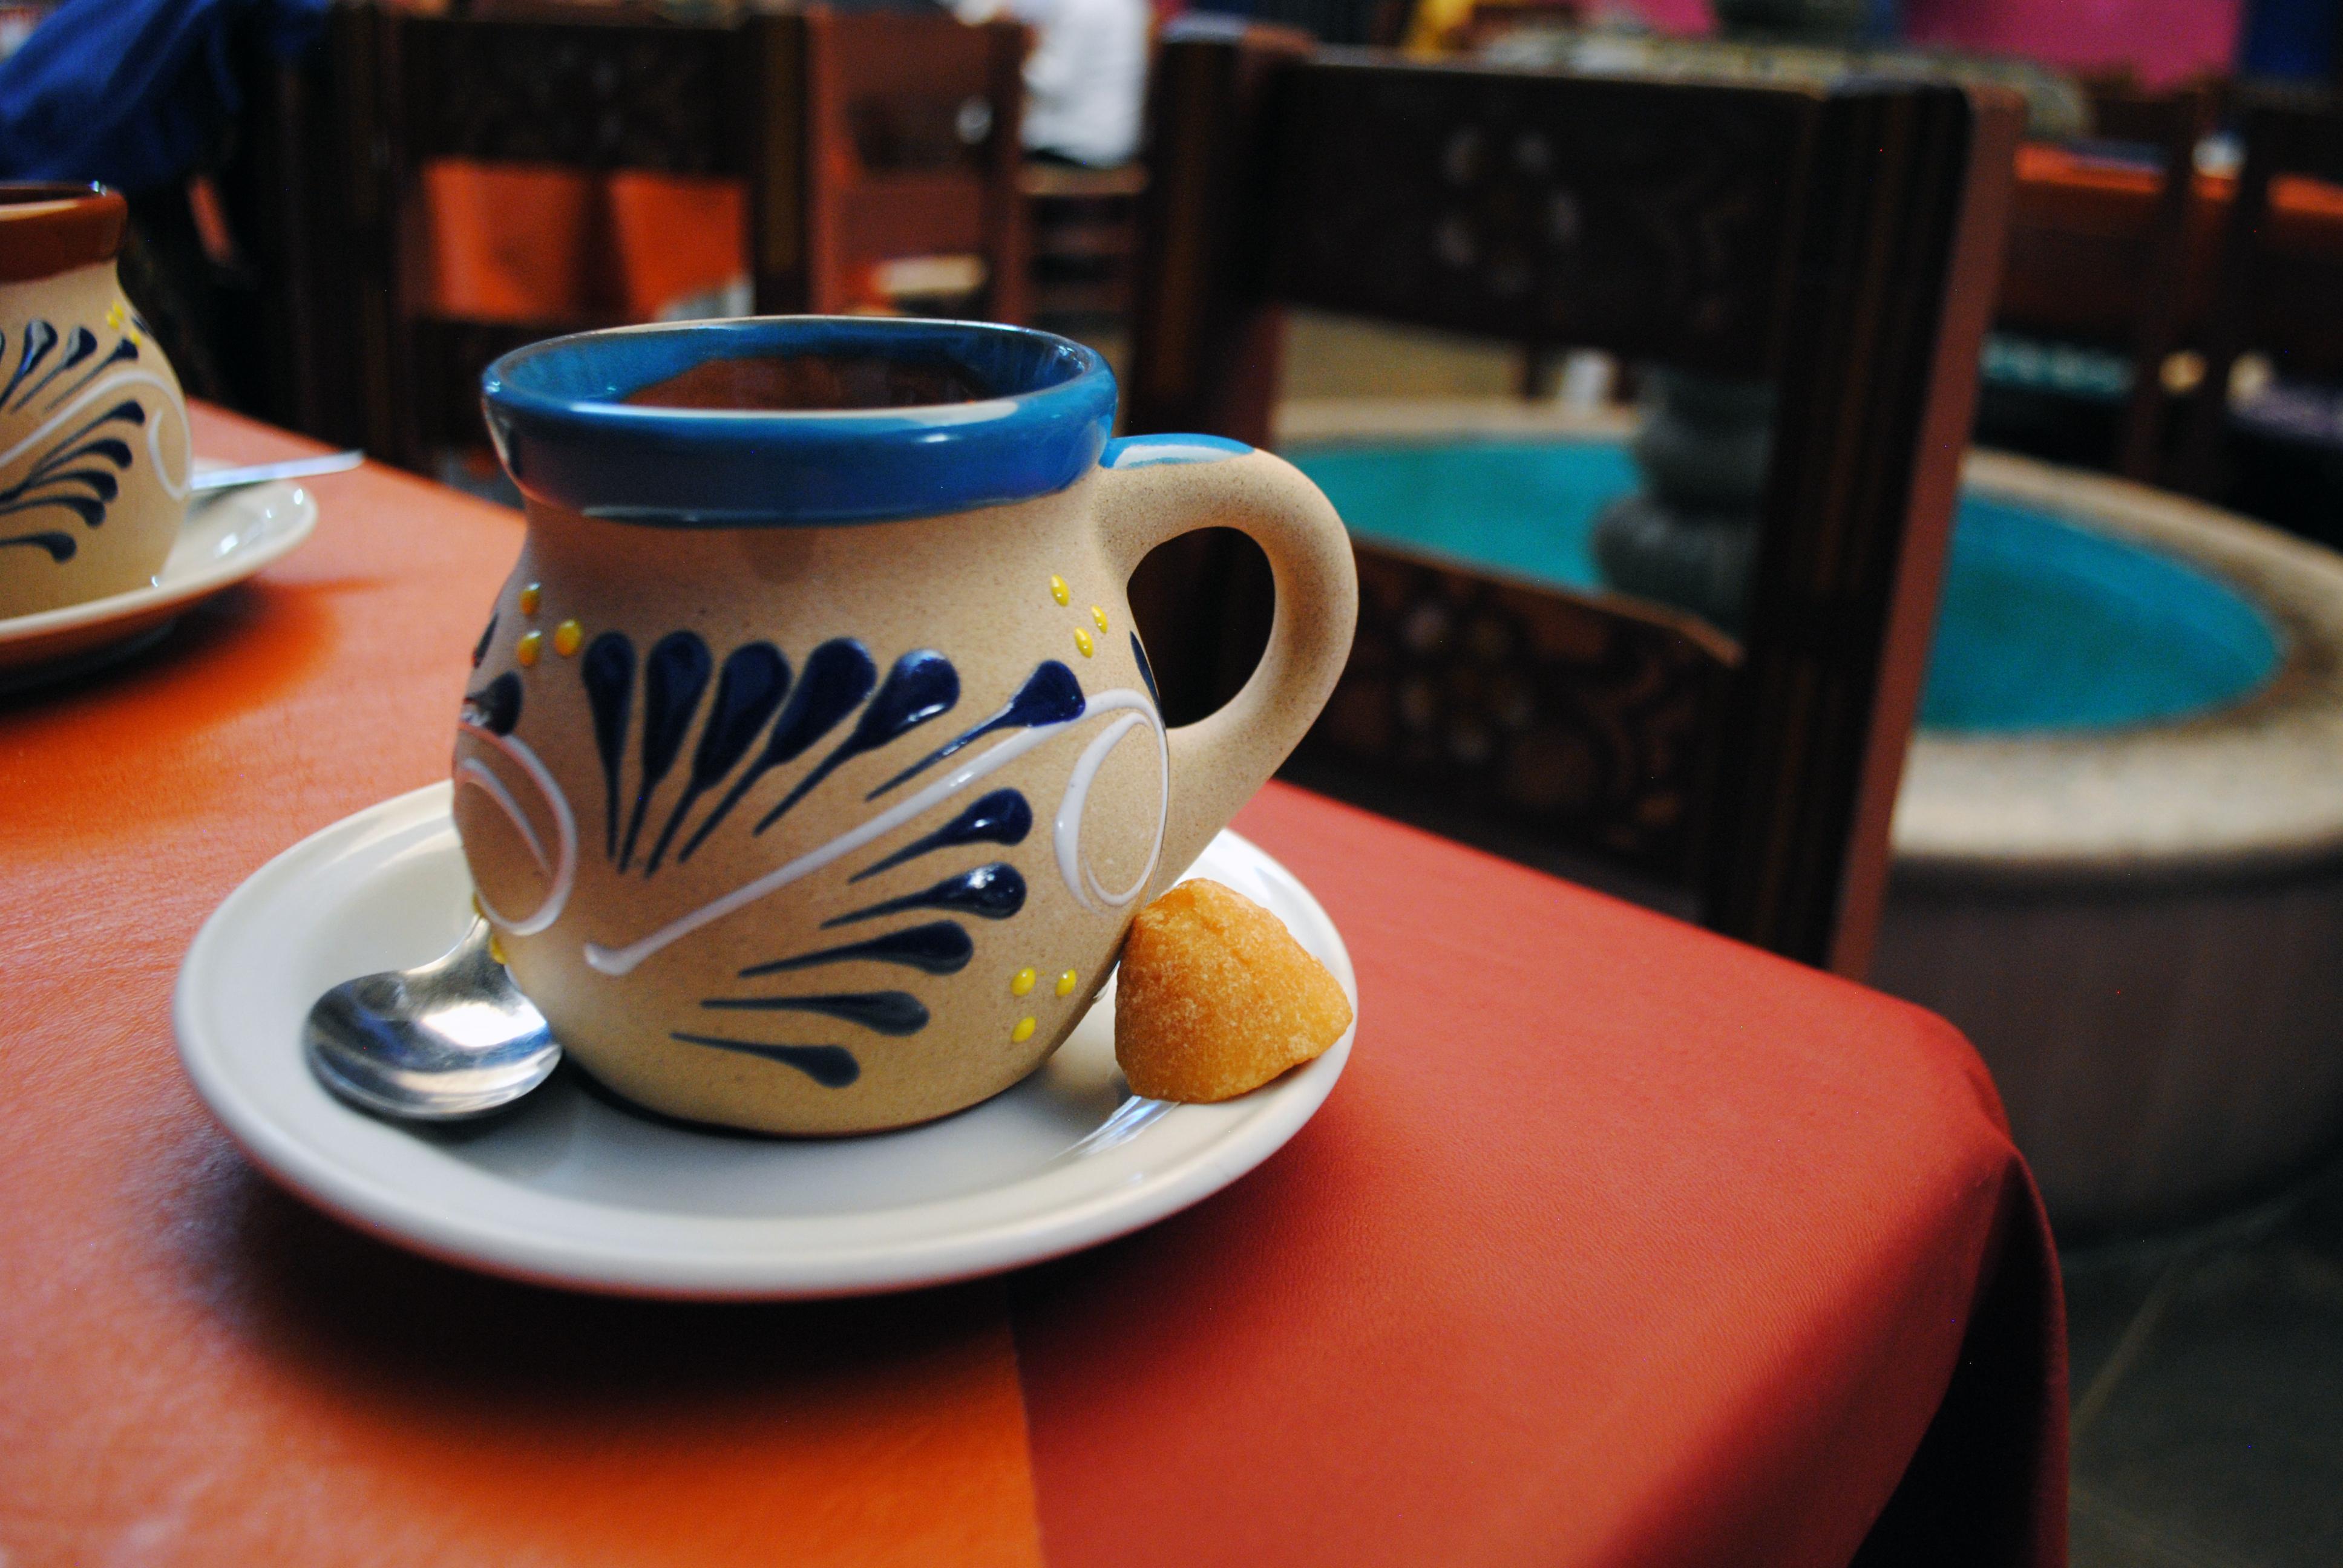 Cafe De Olla History